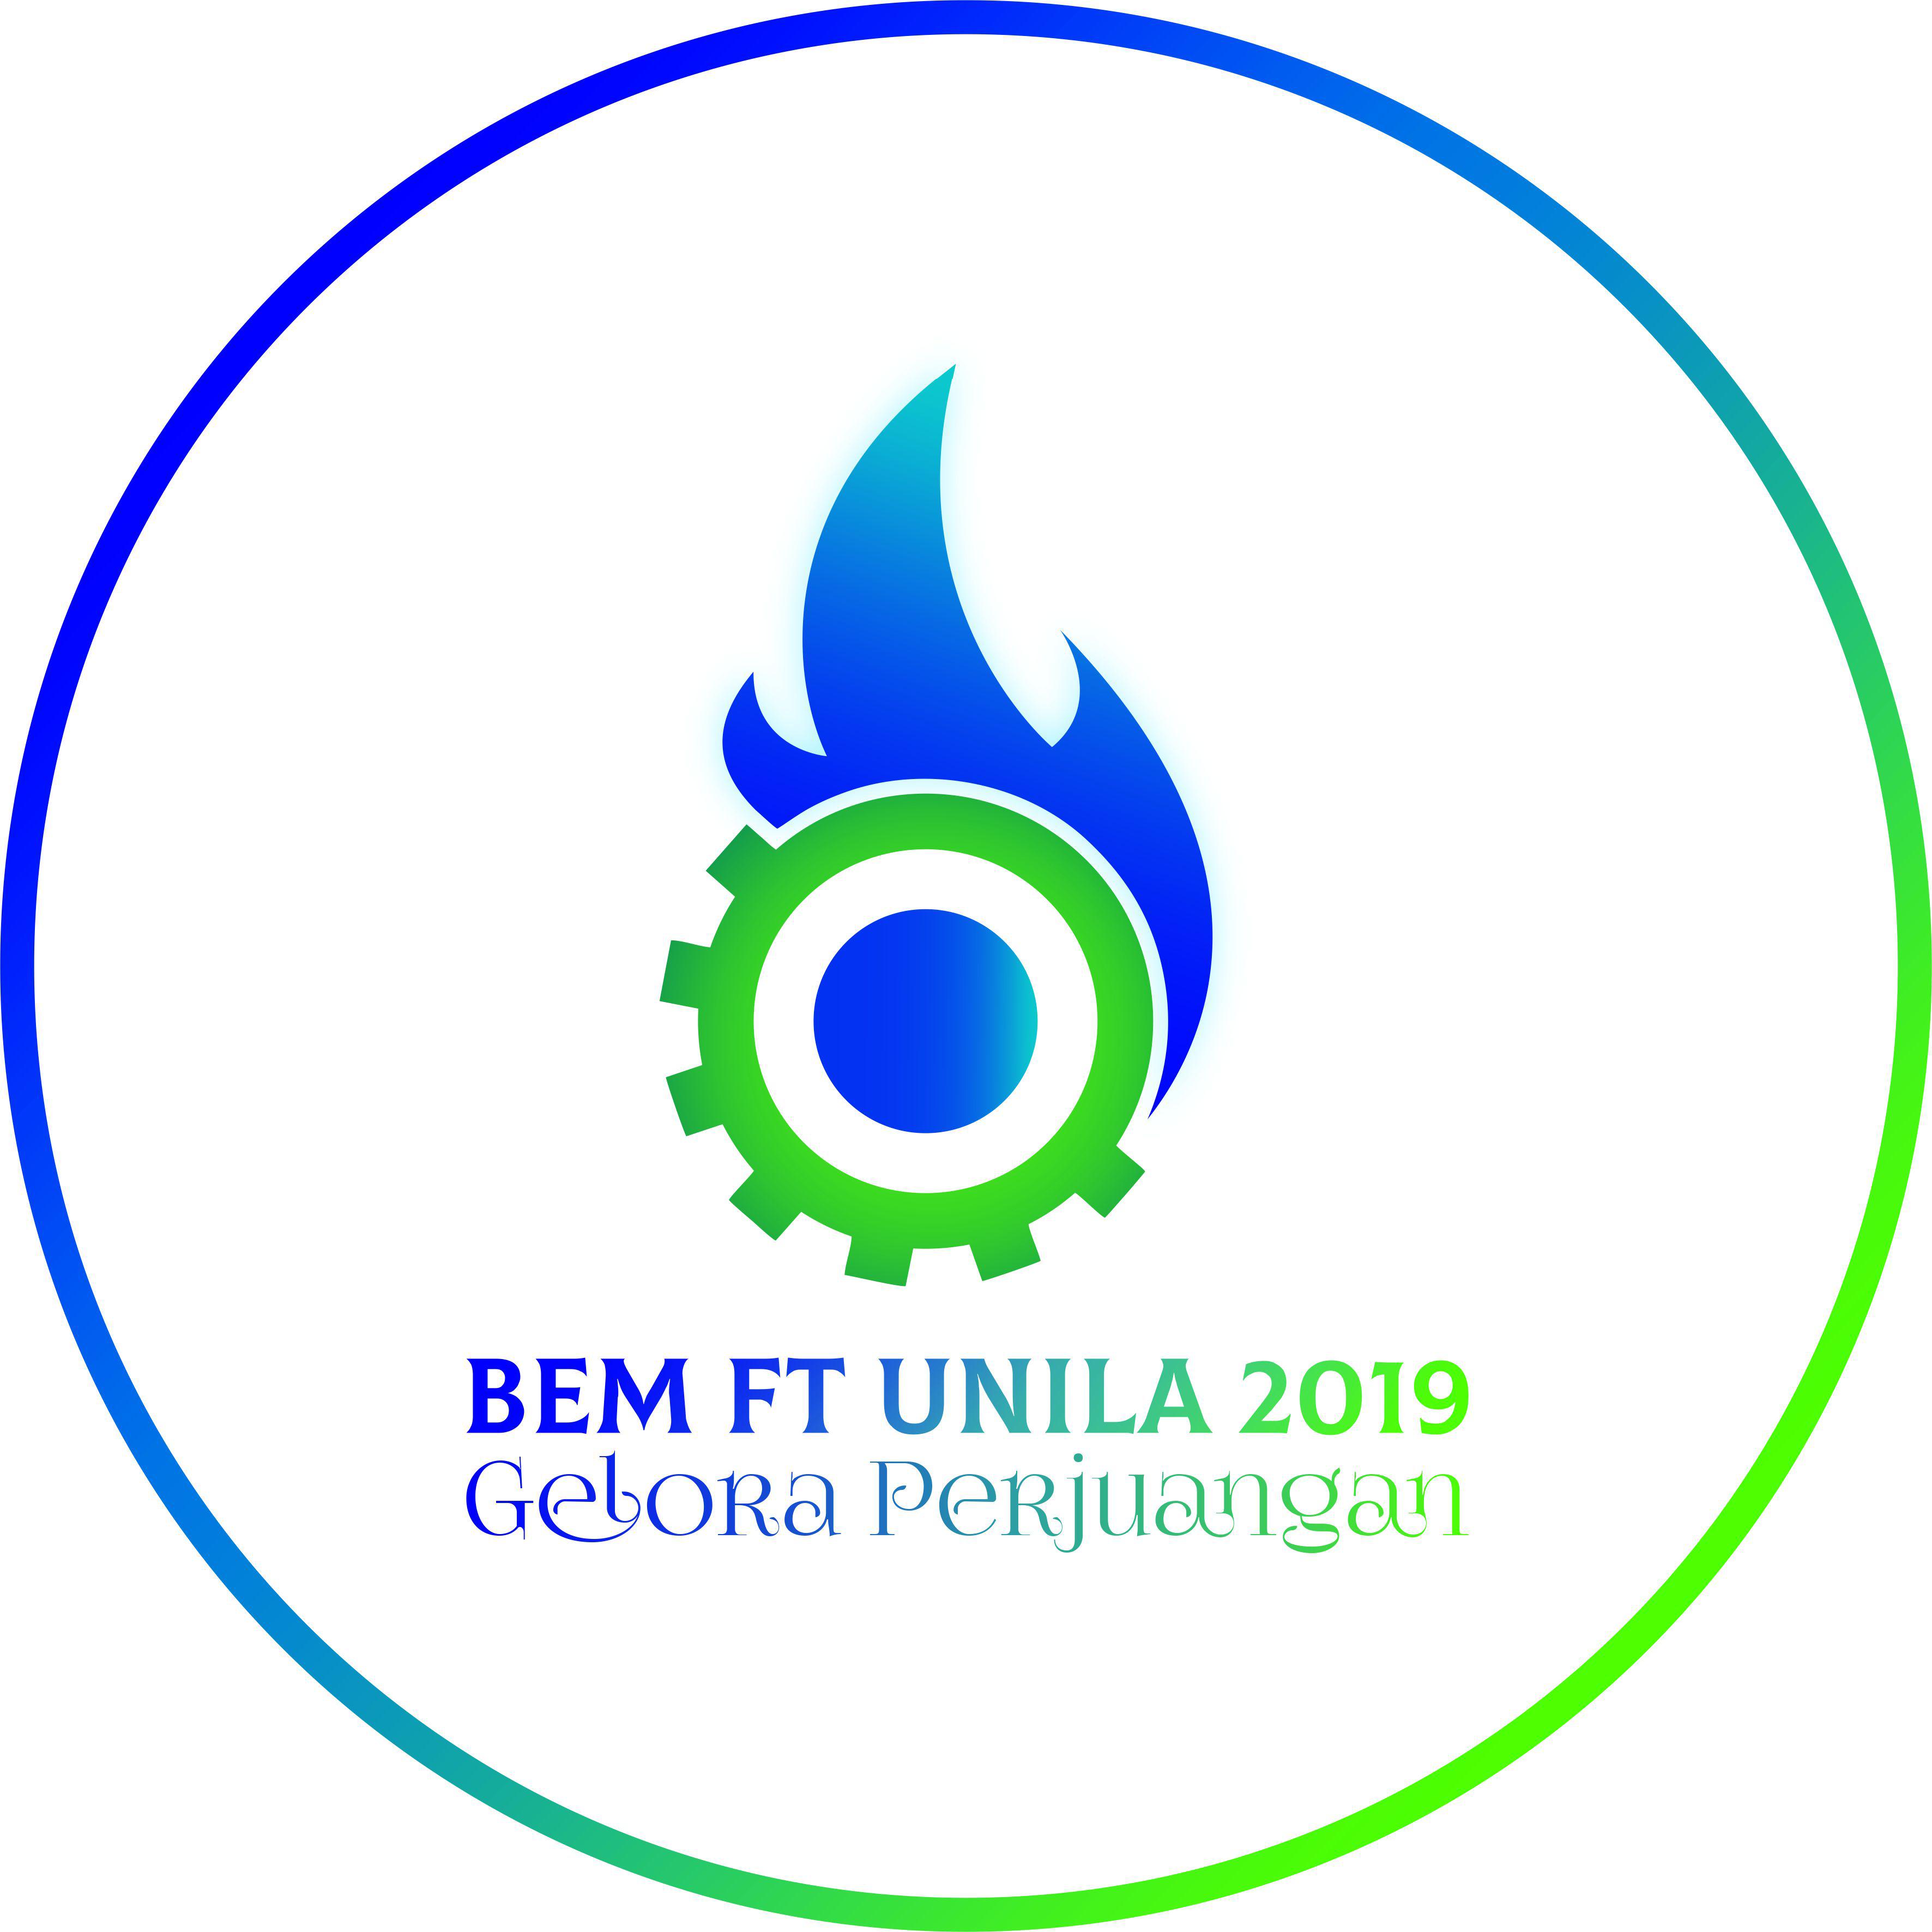 BEM FT UNILA 2020